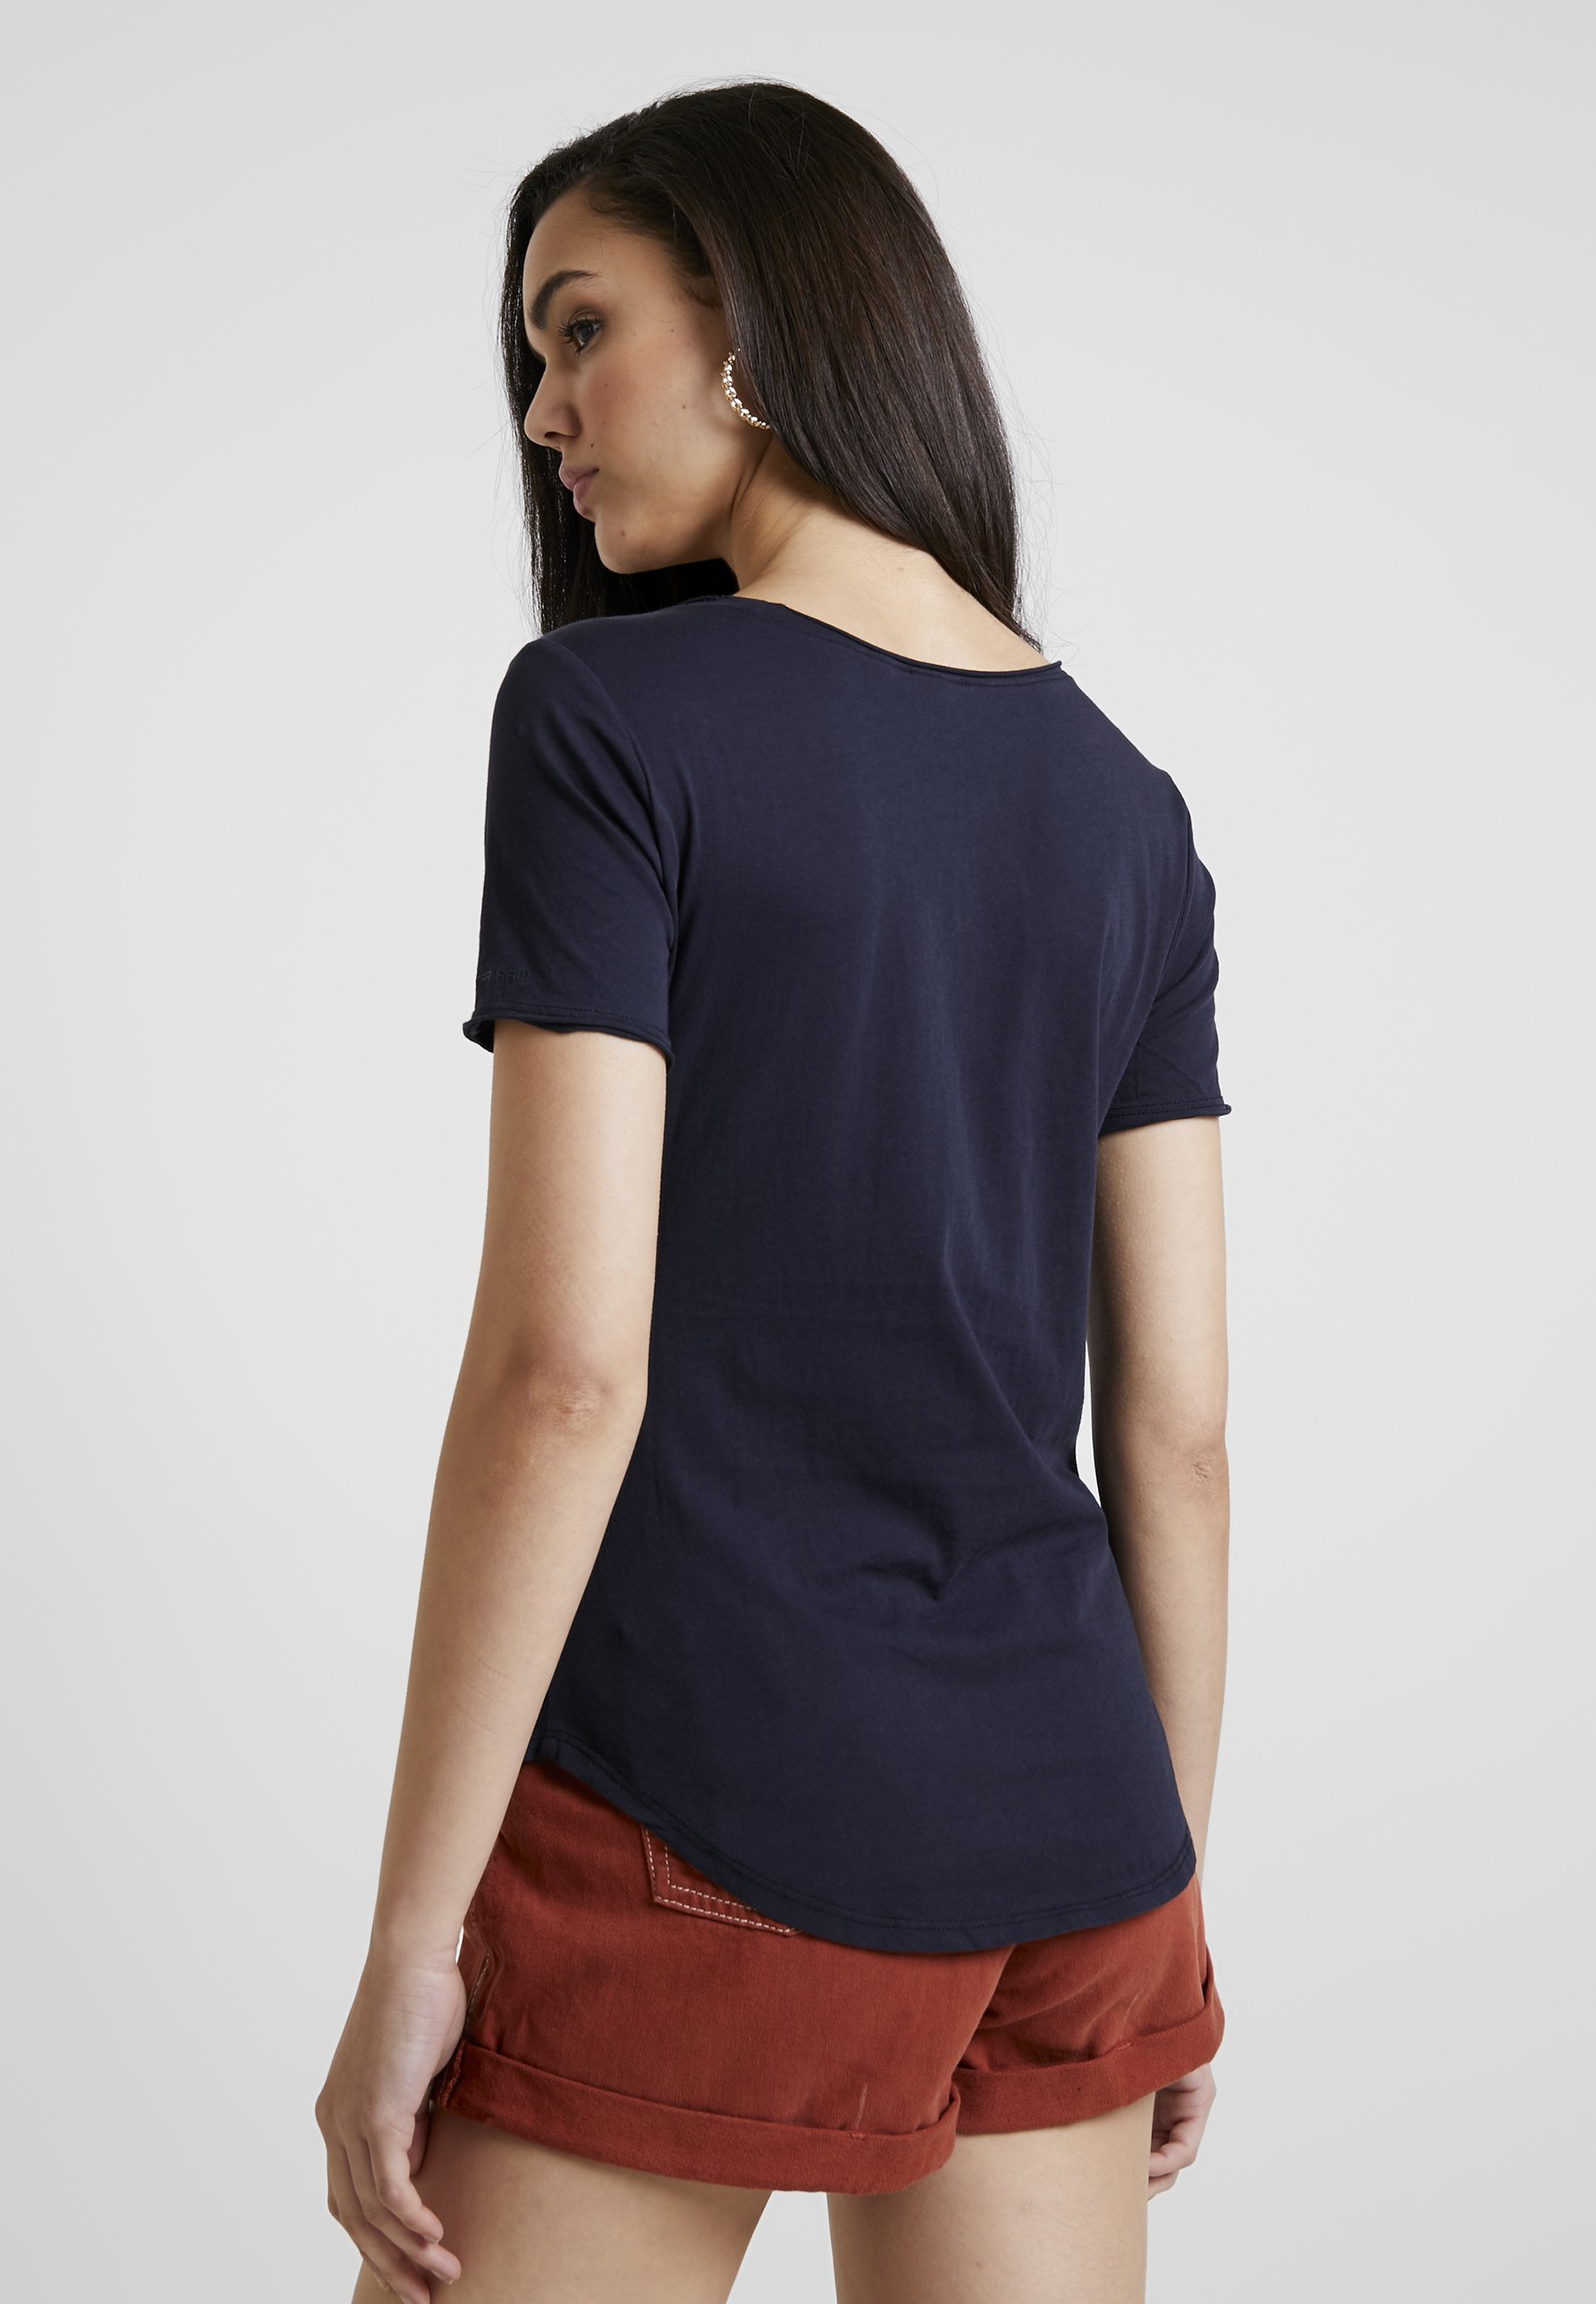 SlimT Imprimé Mazarine Graphic G star Blue shirt Optic BWQrCdexo